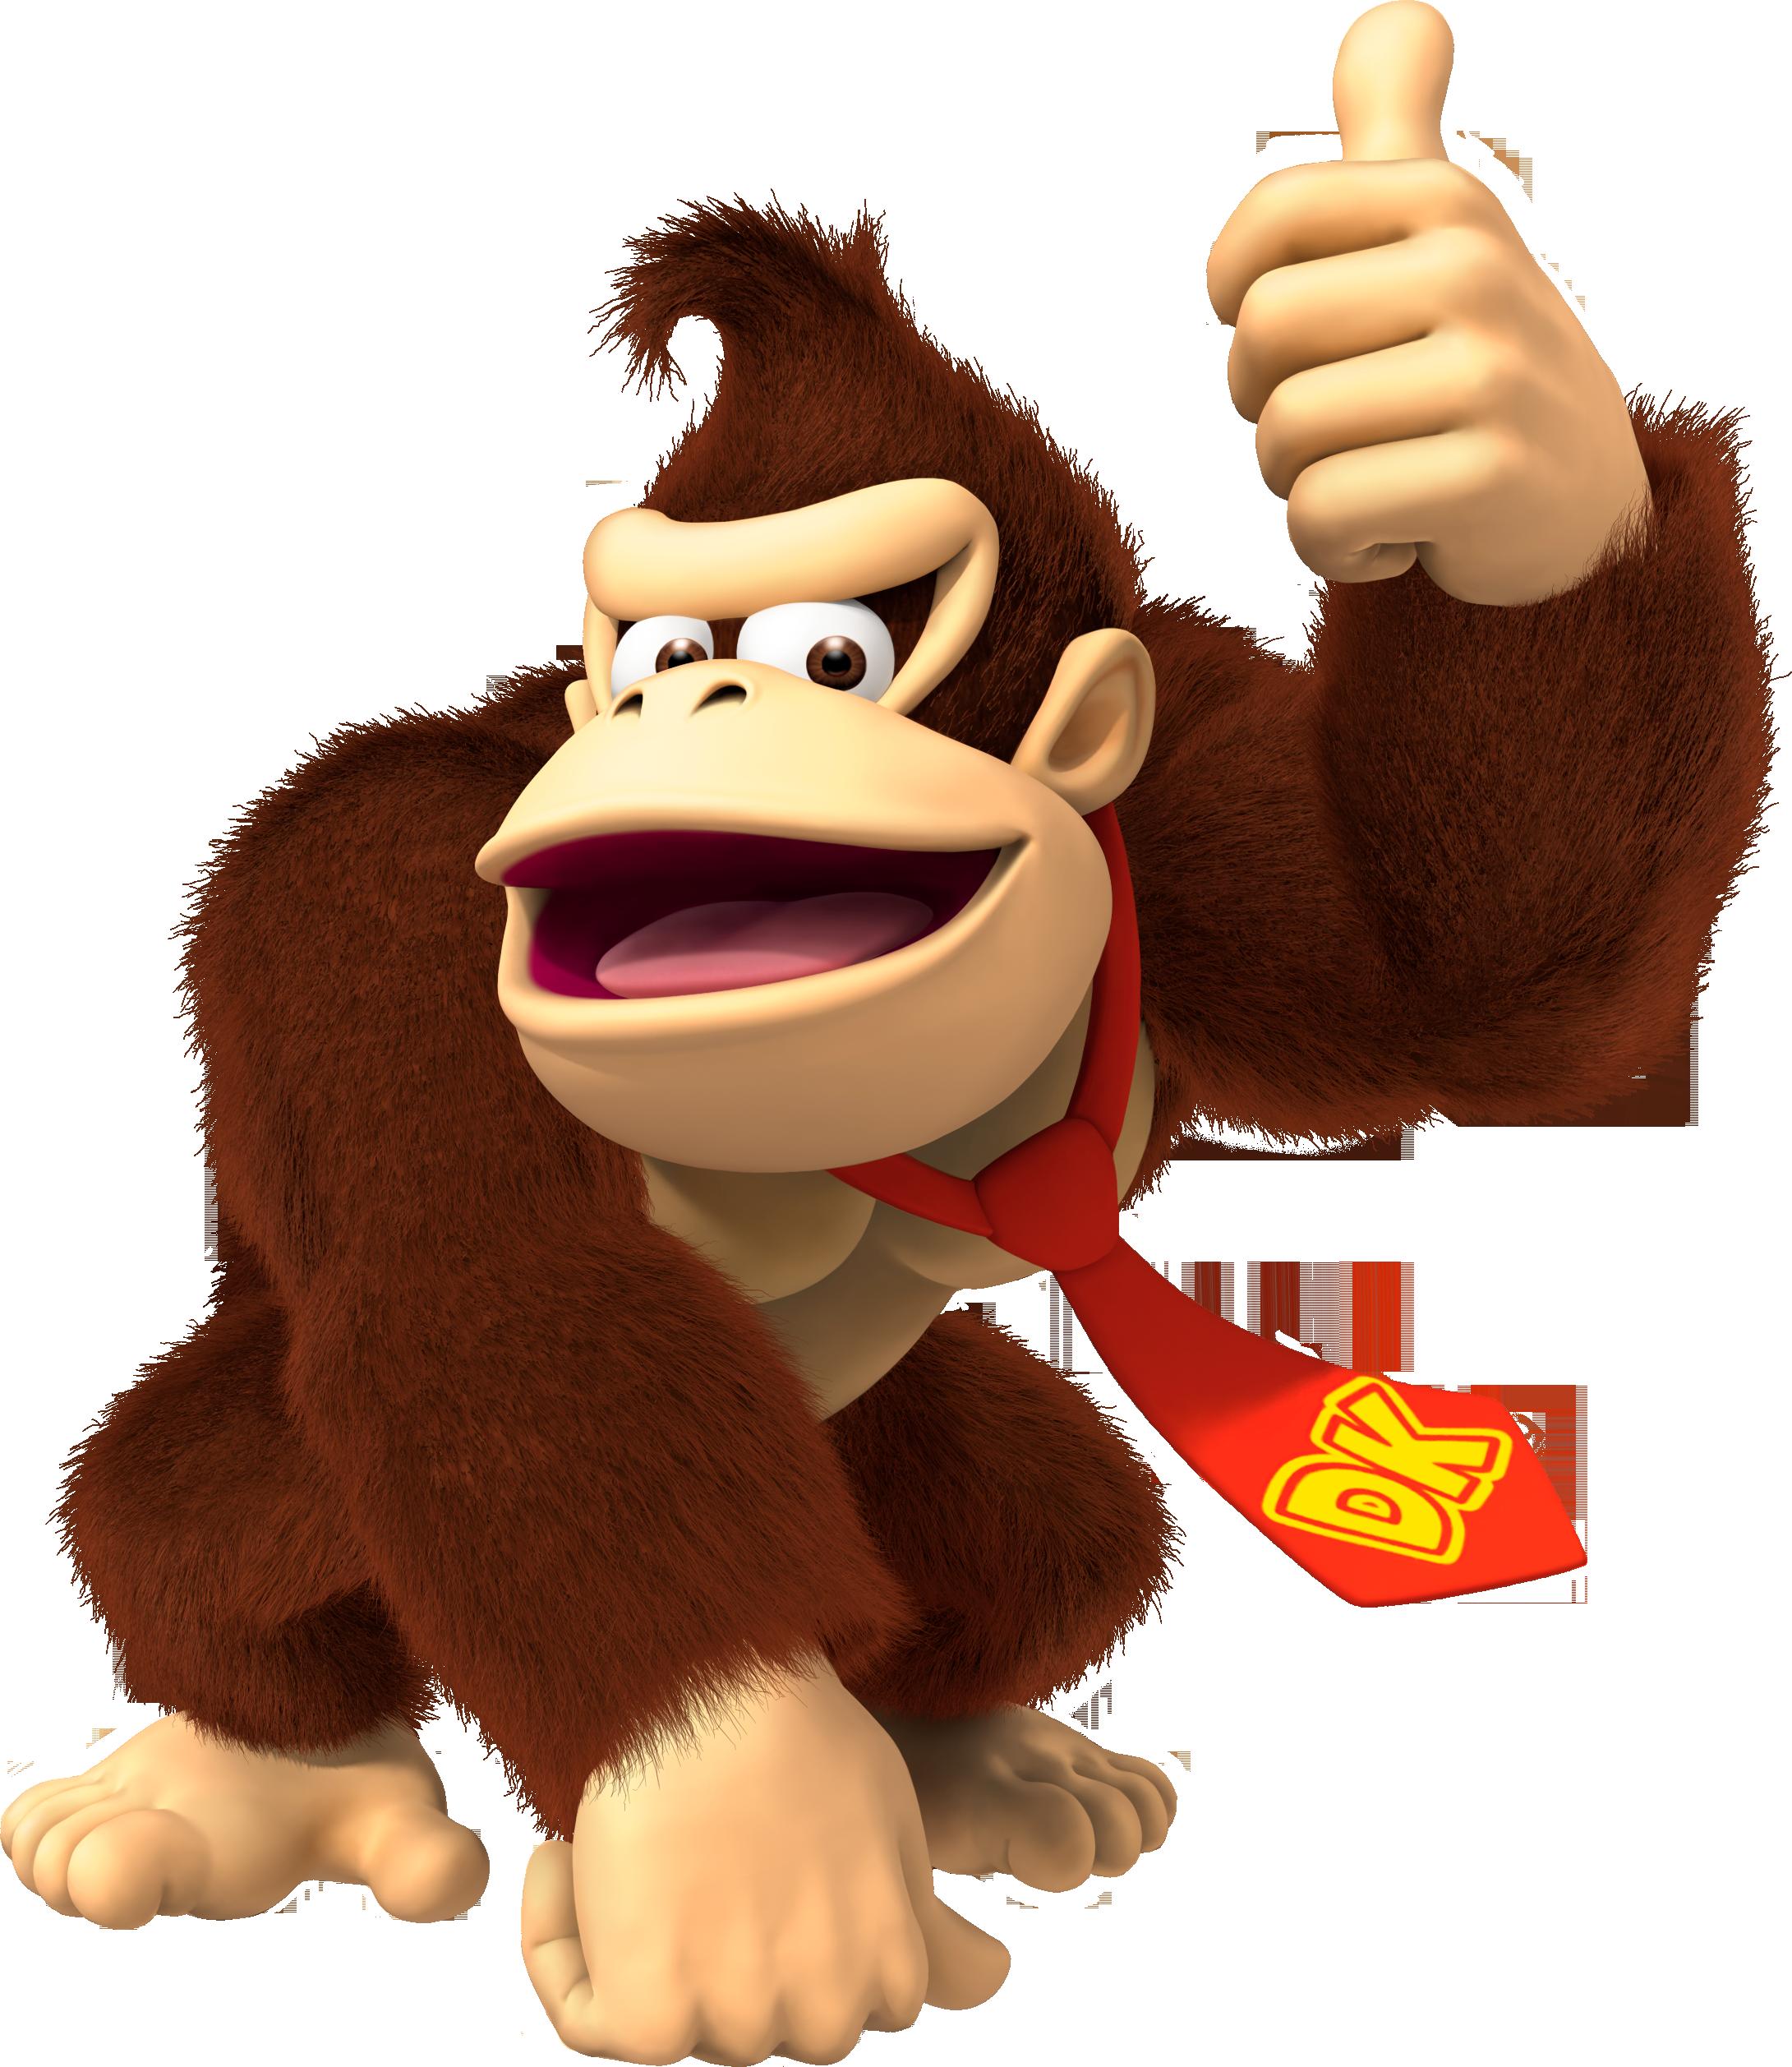 Donkey Kong (Nintendo vs. Capcom)